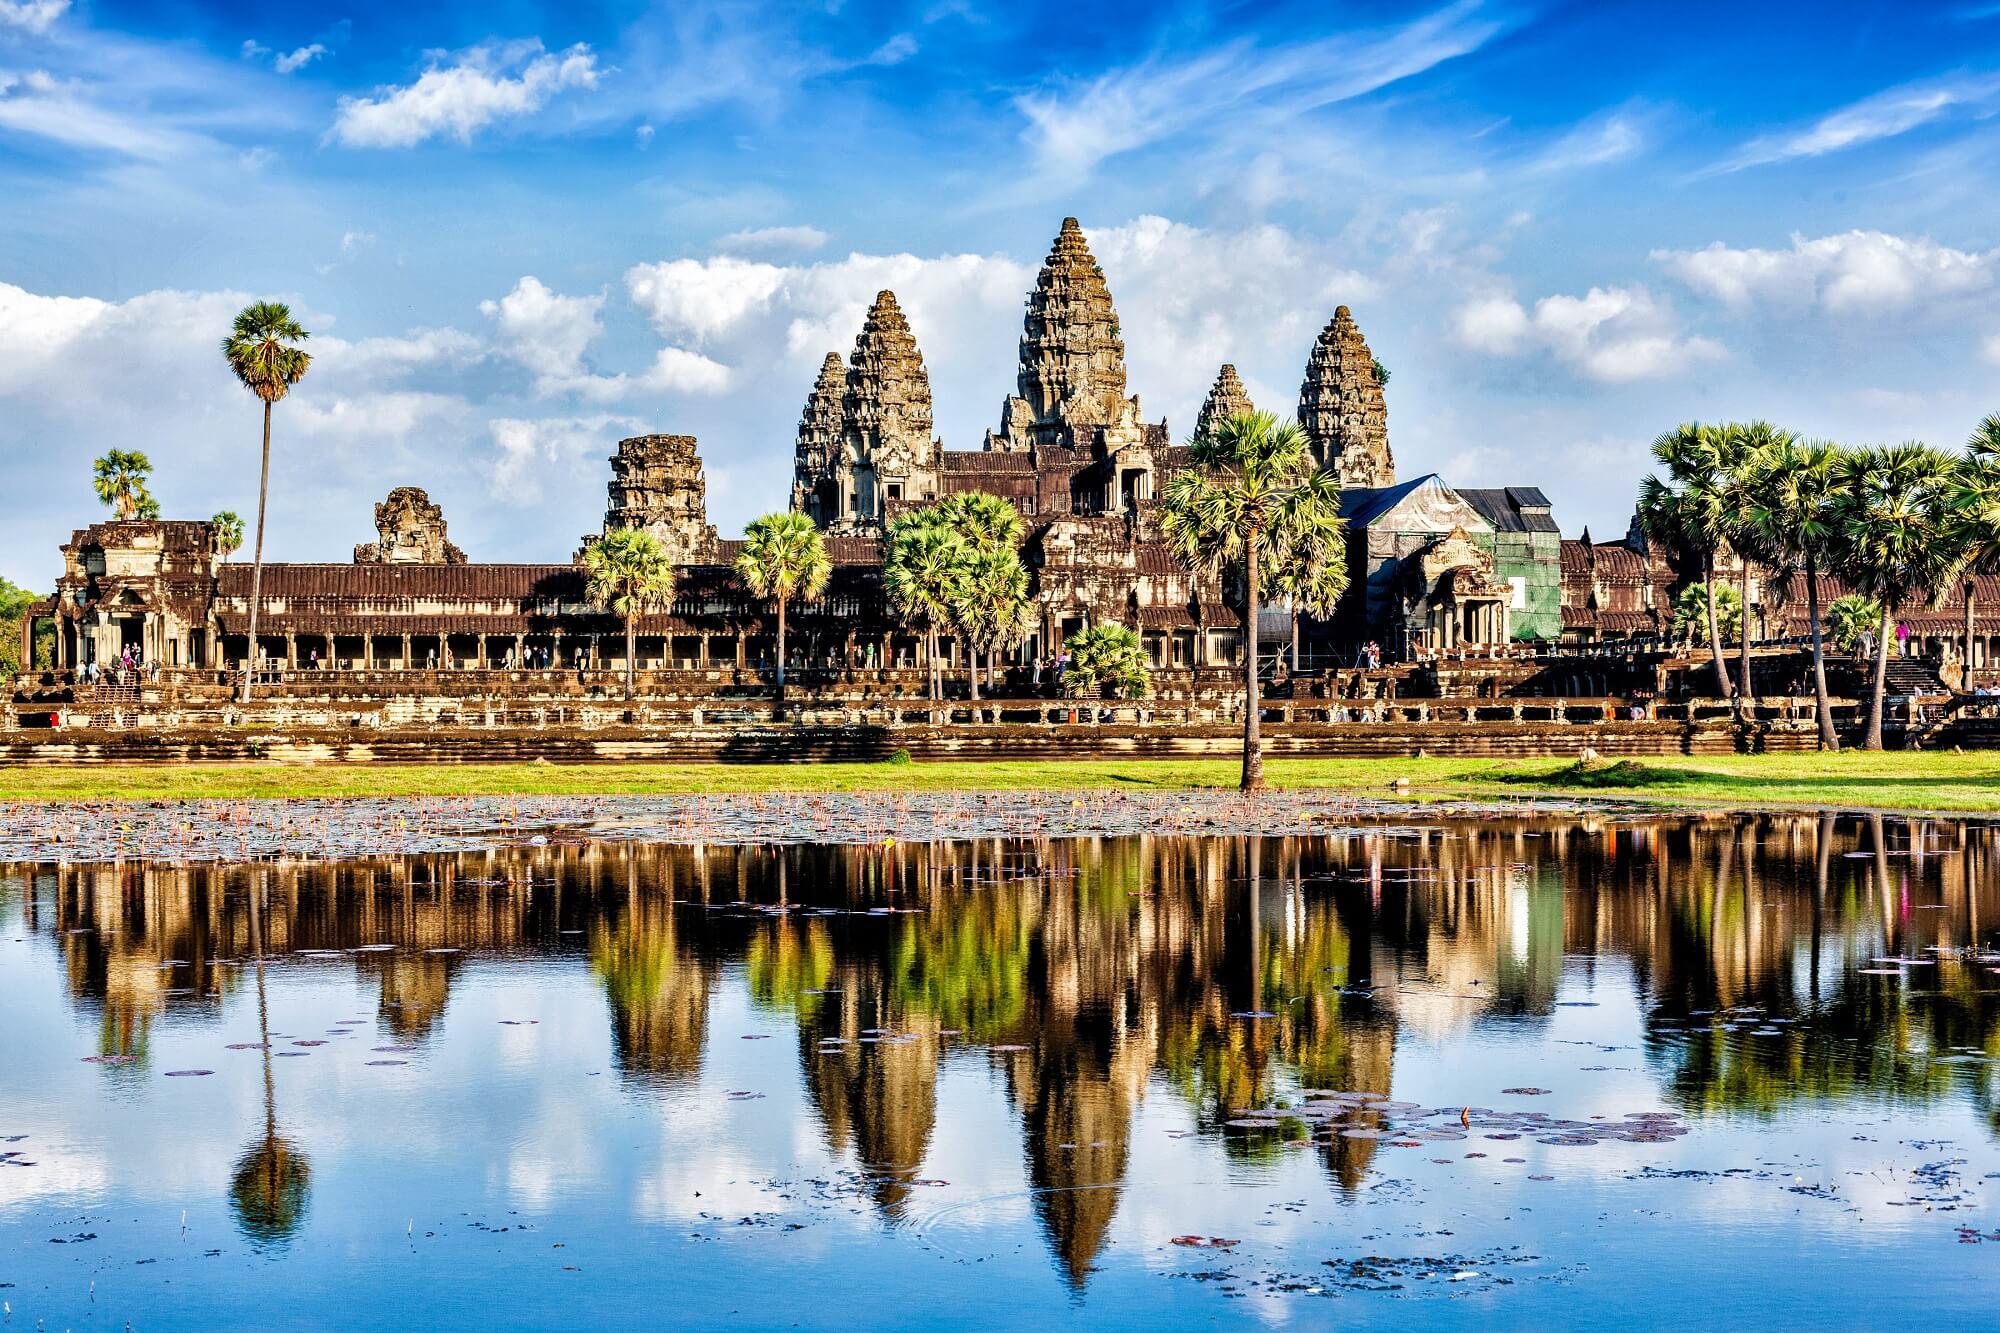 Die beeindruckende Tempelanlage Angkor Wat in Siem Reap